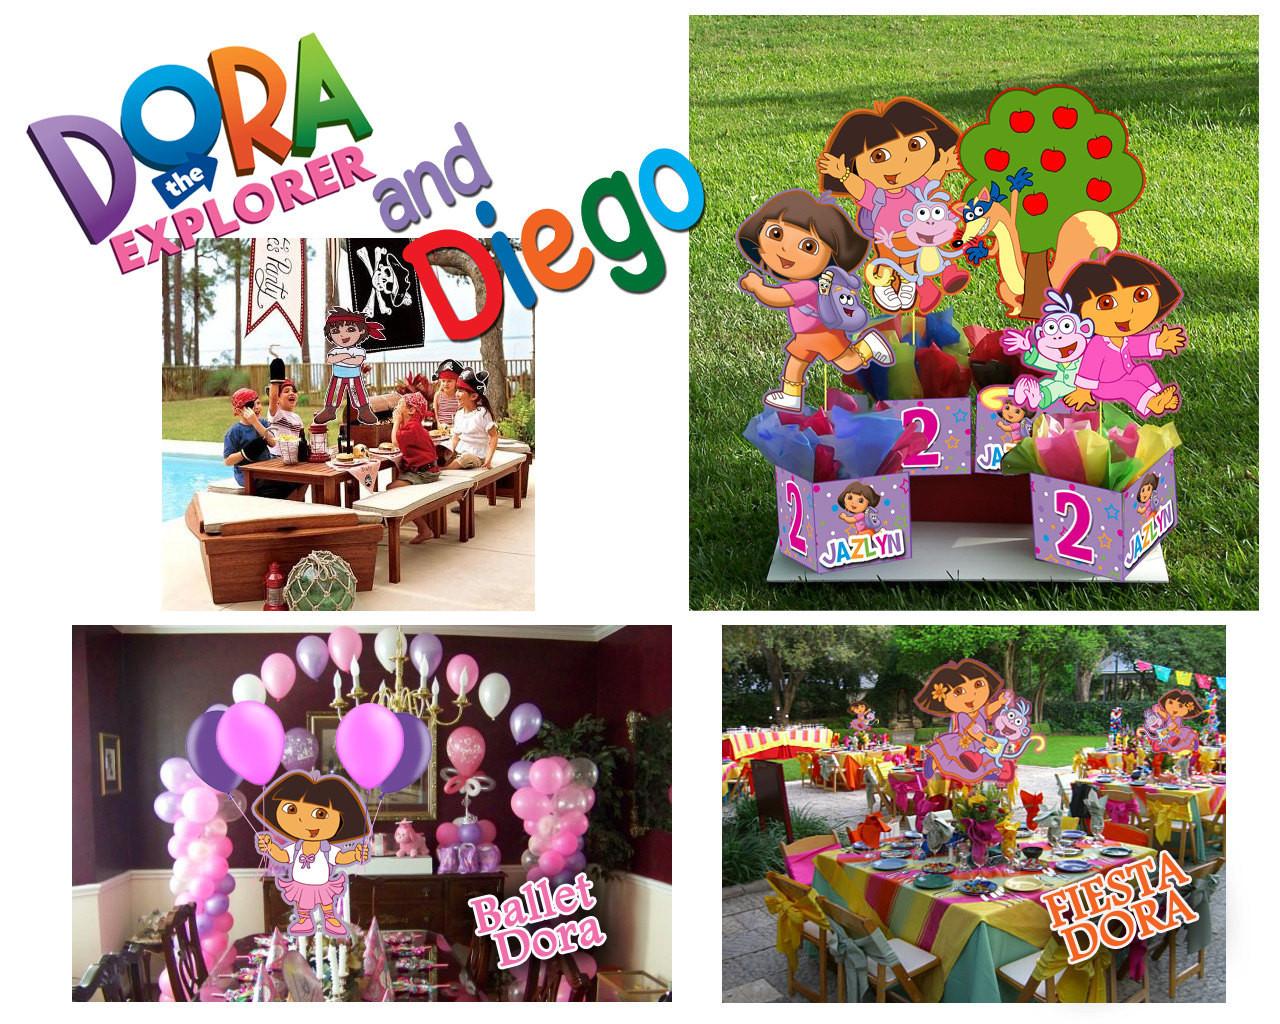 Dora Birthday Decorations  DORA THE EXPLORER Birthday Party Centerpiece 3 feet tall